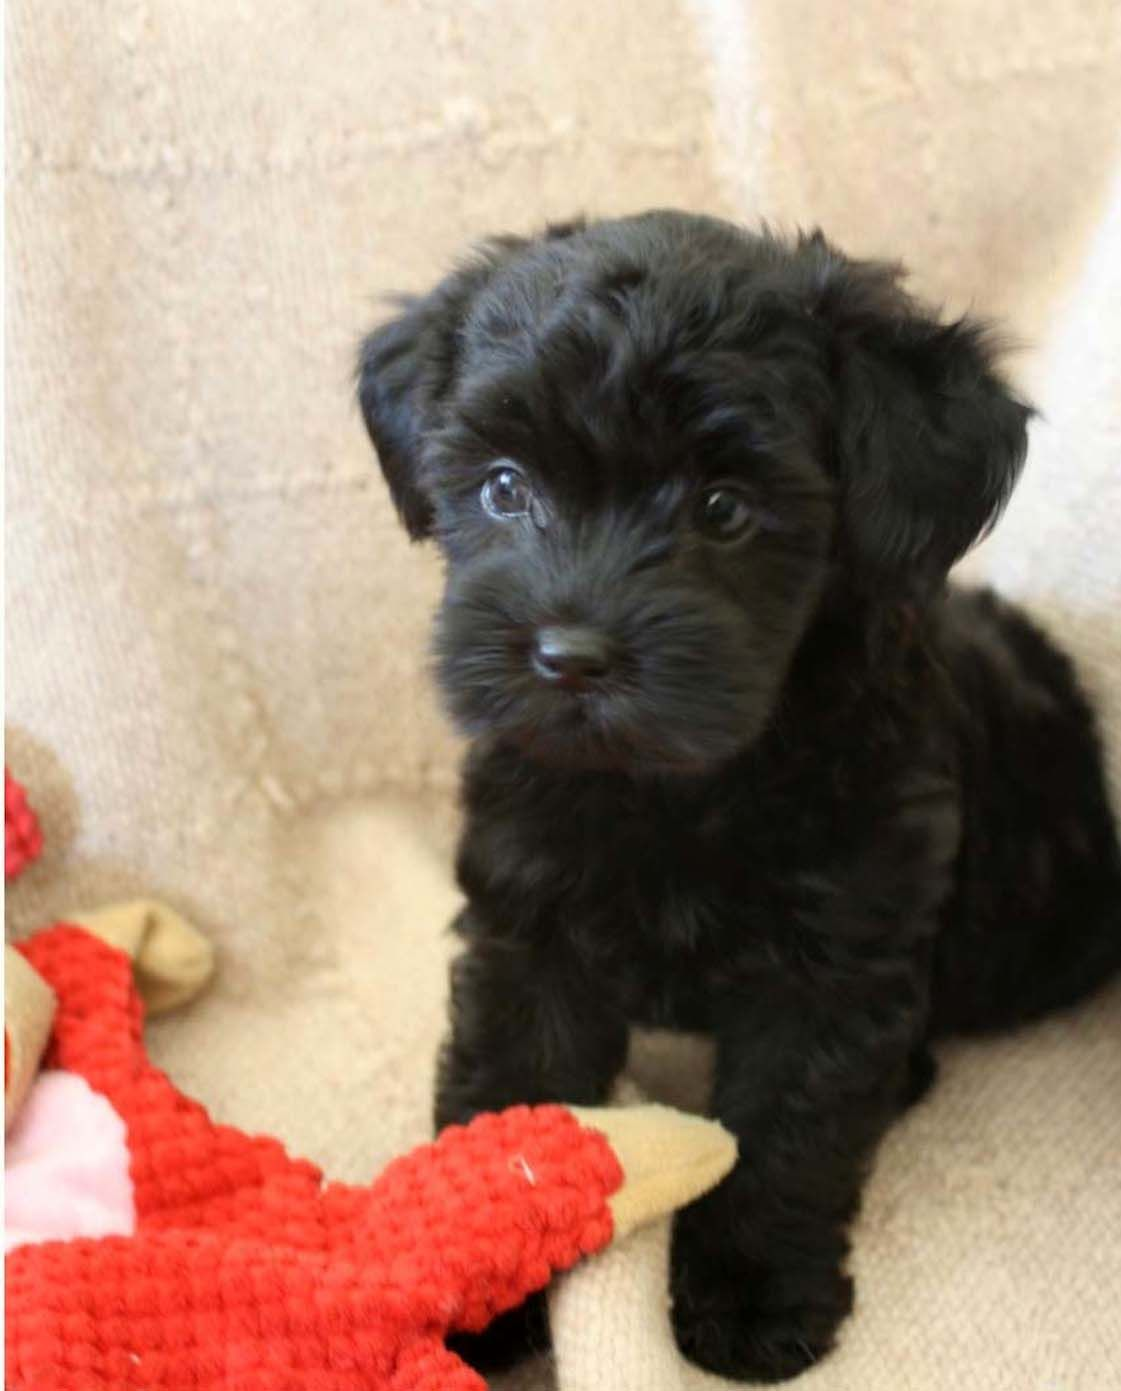 Miniature Maltese Black | www.pixshark.com - Images ... Black Maltese Poodle Puppies